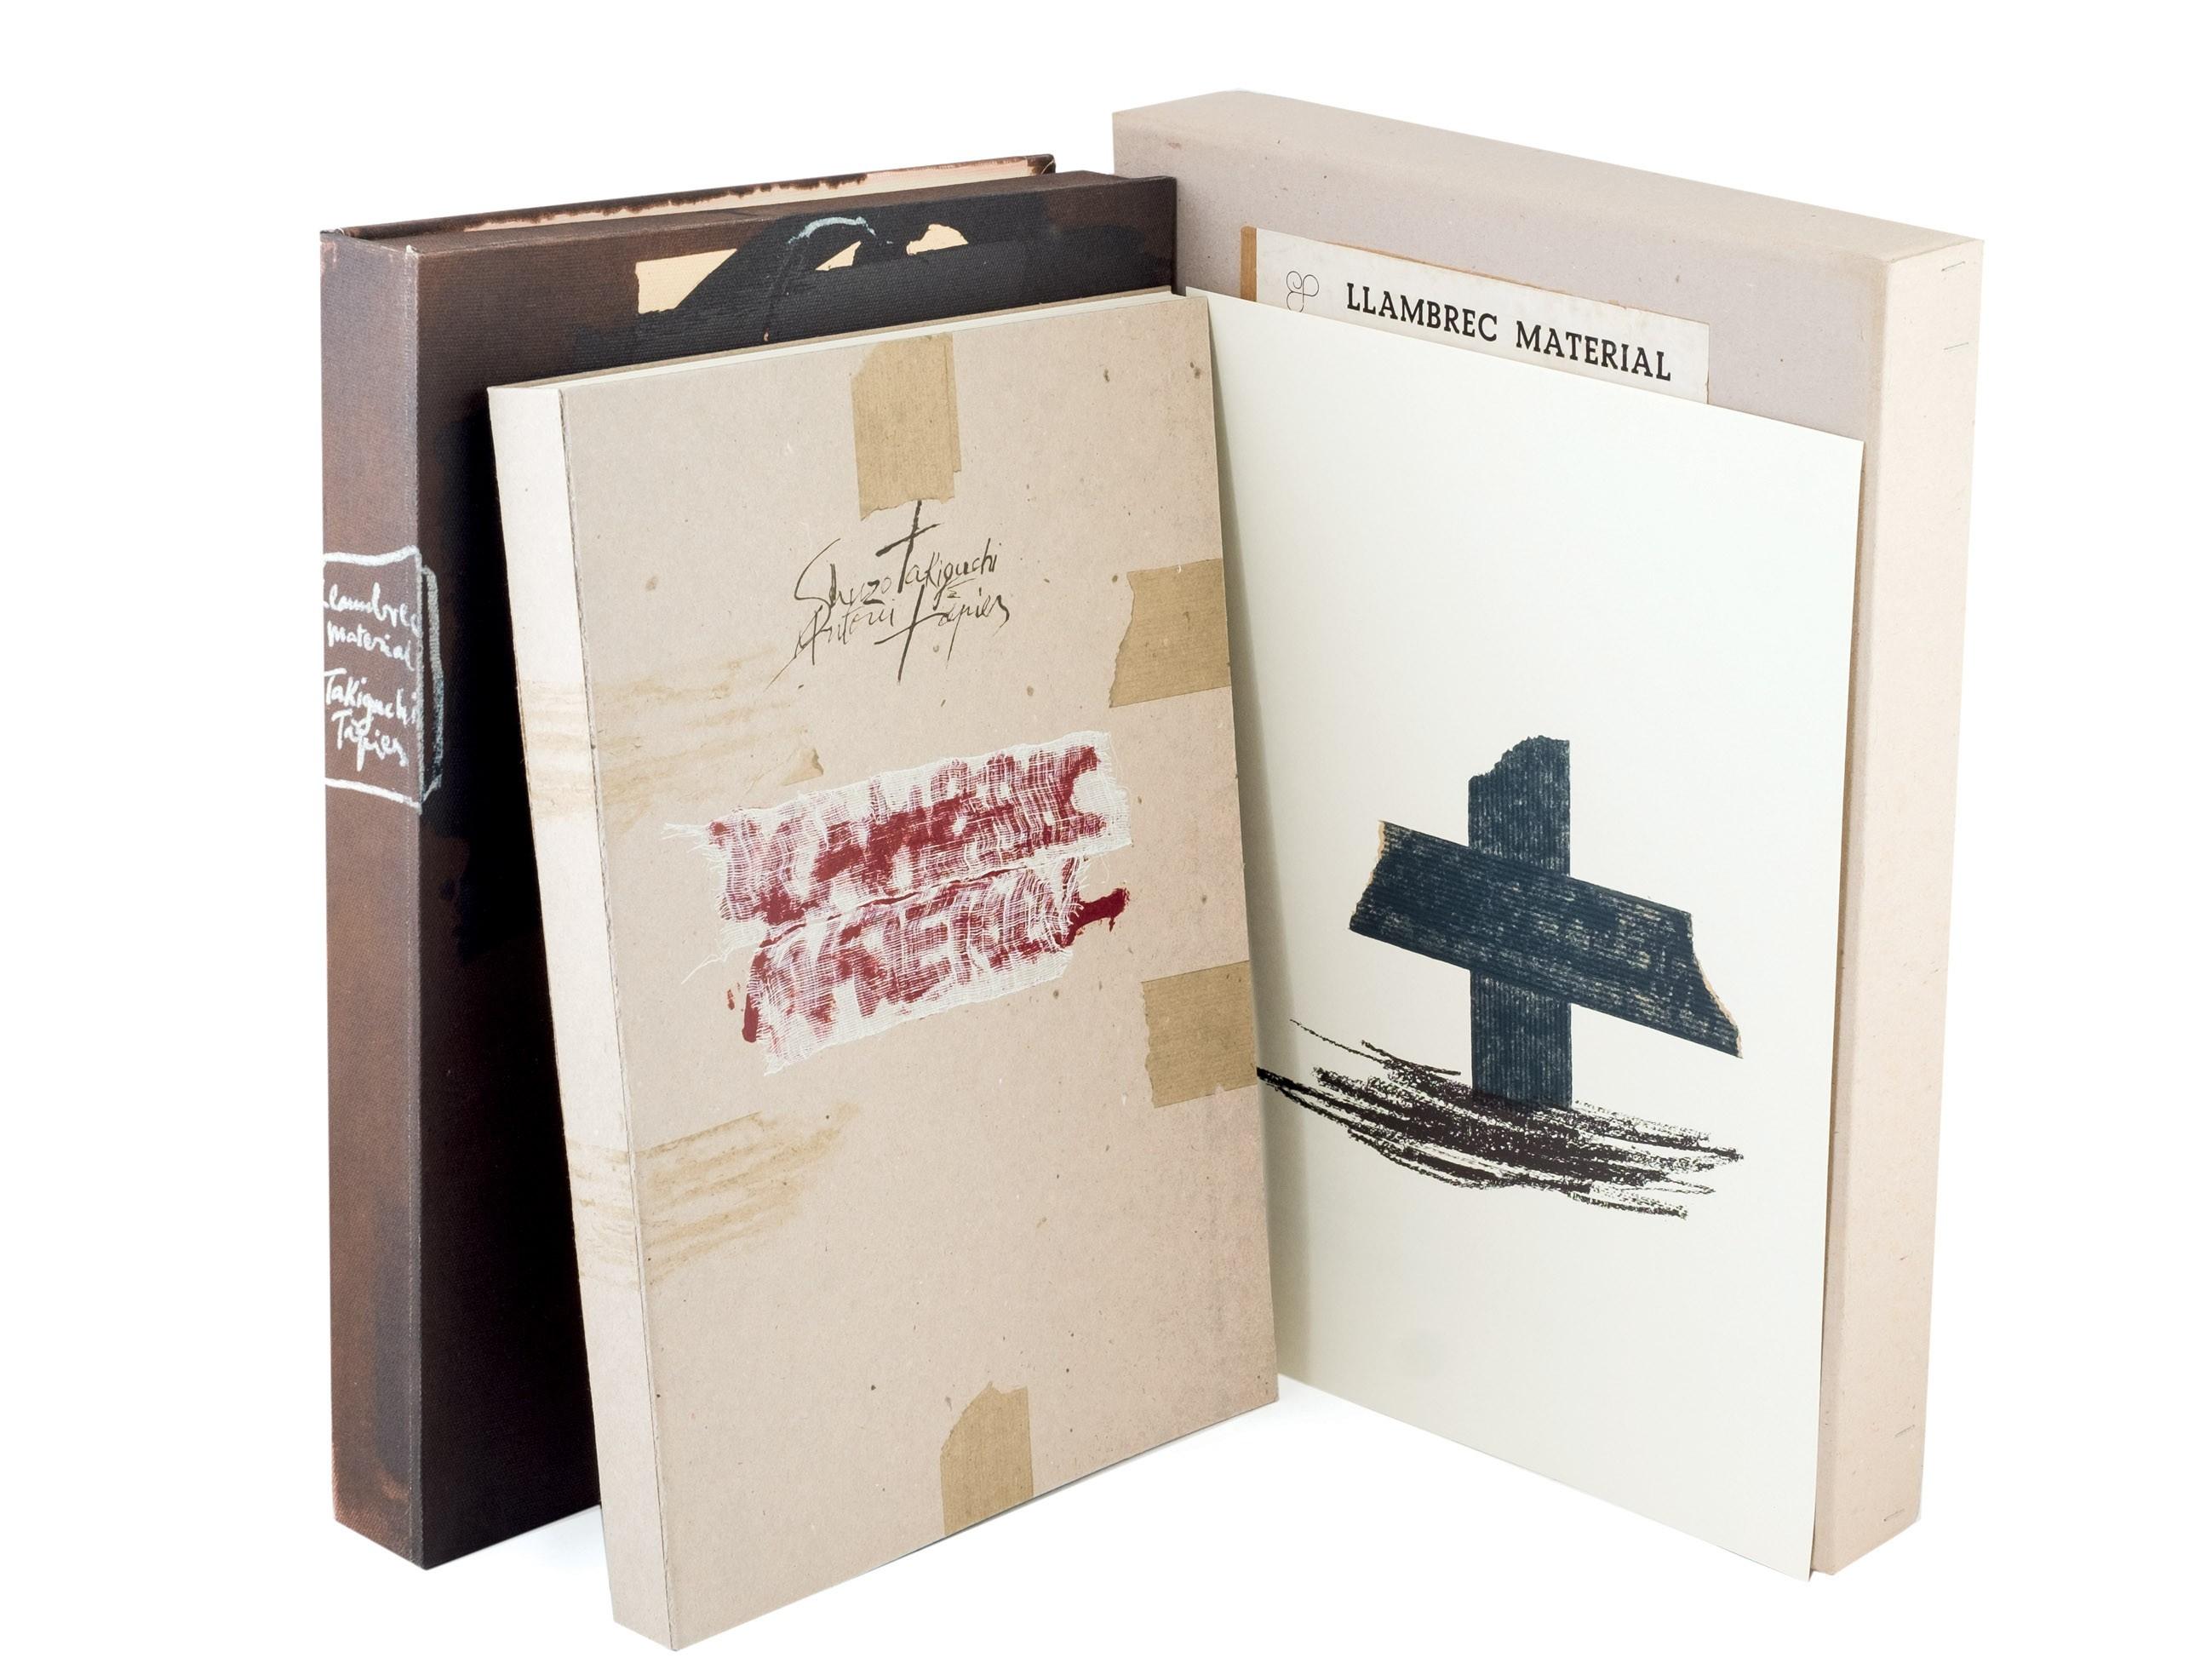 'Llambrec Material', book, 1957. Illustrations by Tàpies and poems by Shuzo Takiguchi. Photo: Durán Arte y Subastas